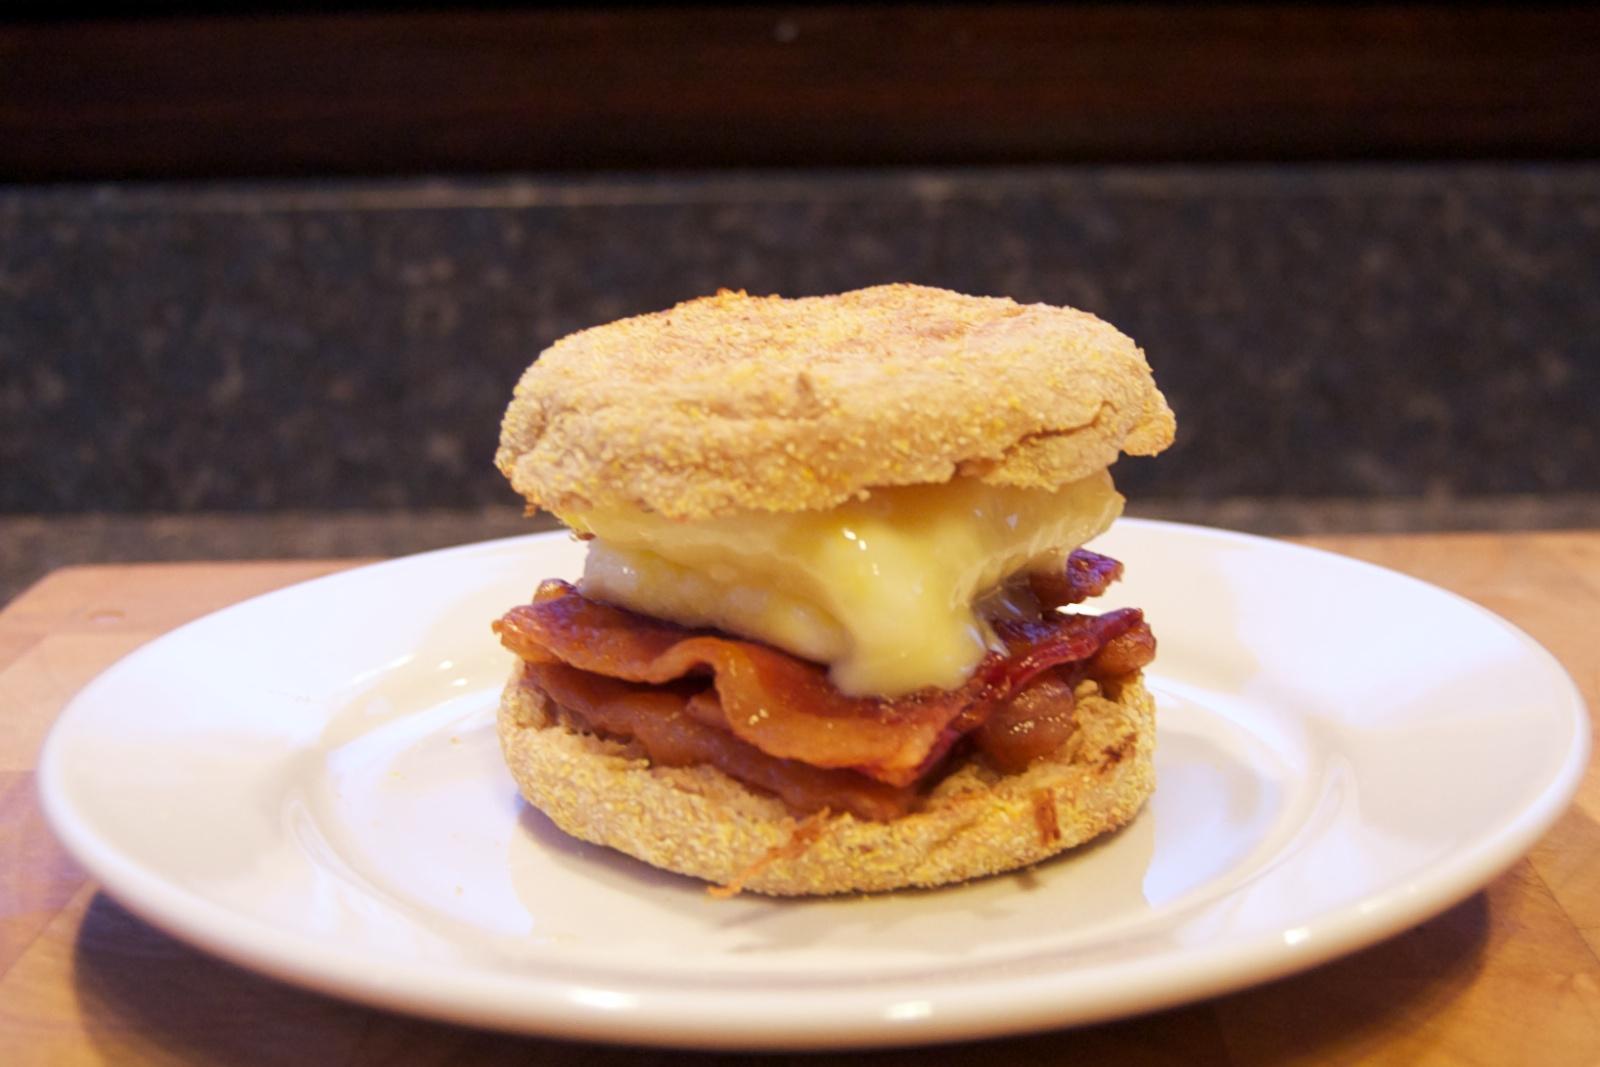 http://blog.rickk.com/food/2013/04/18/ate.2013.04.18.b.jpg